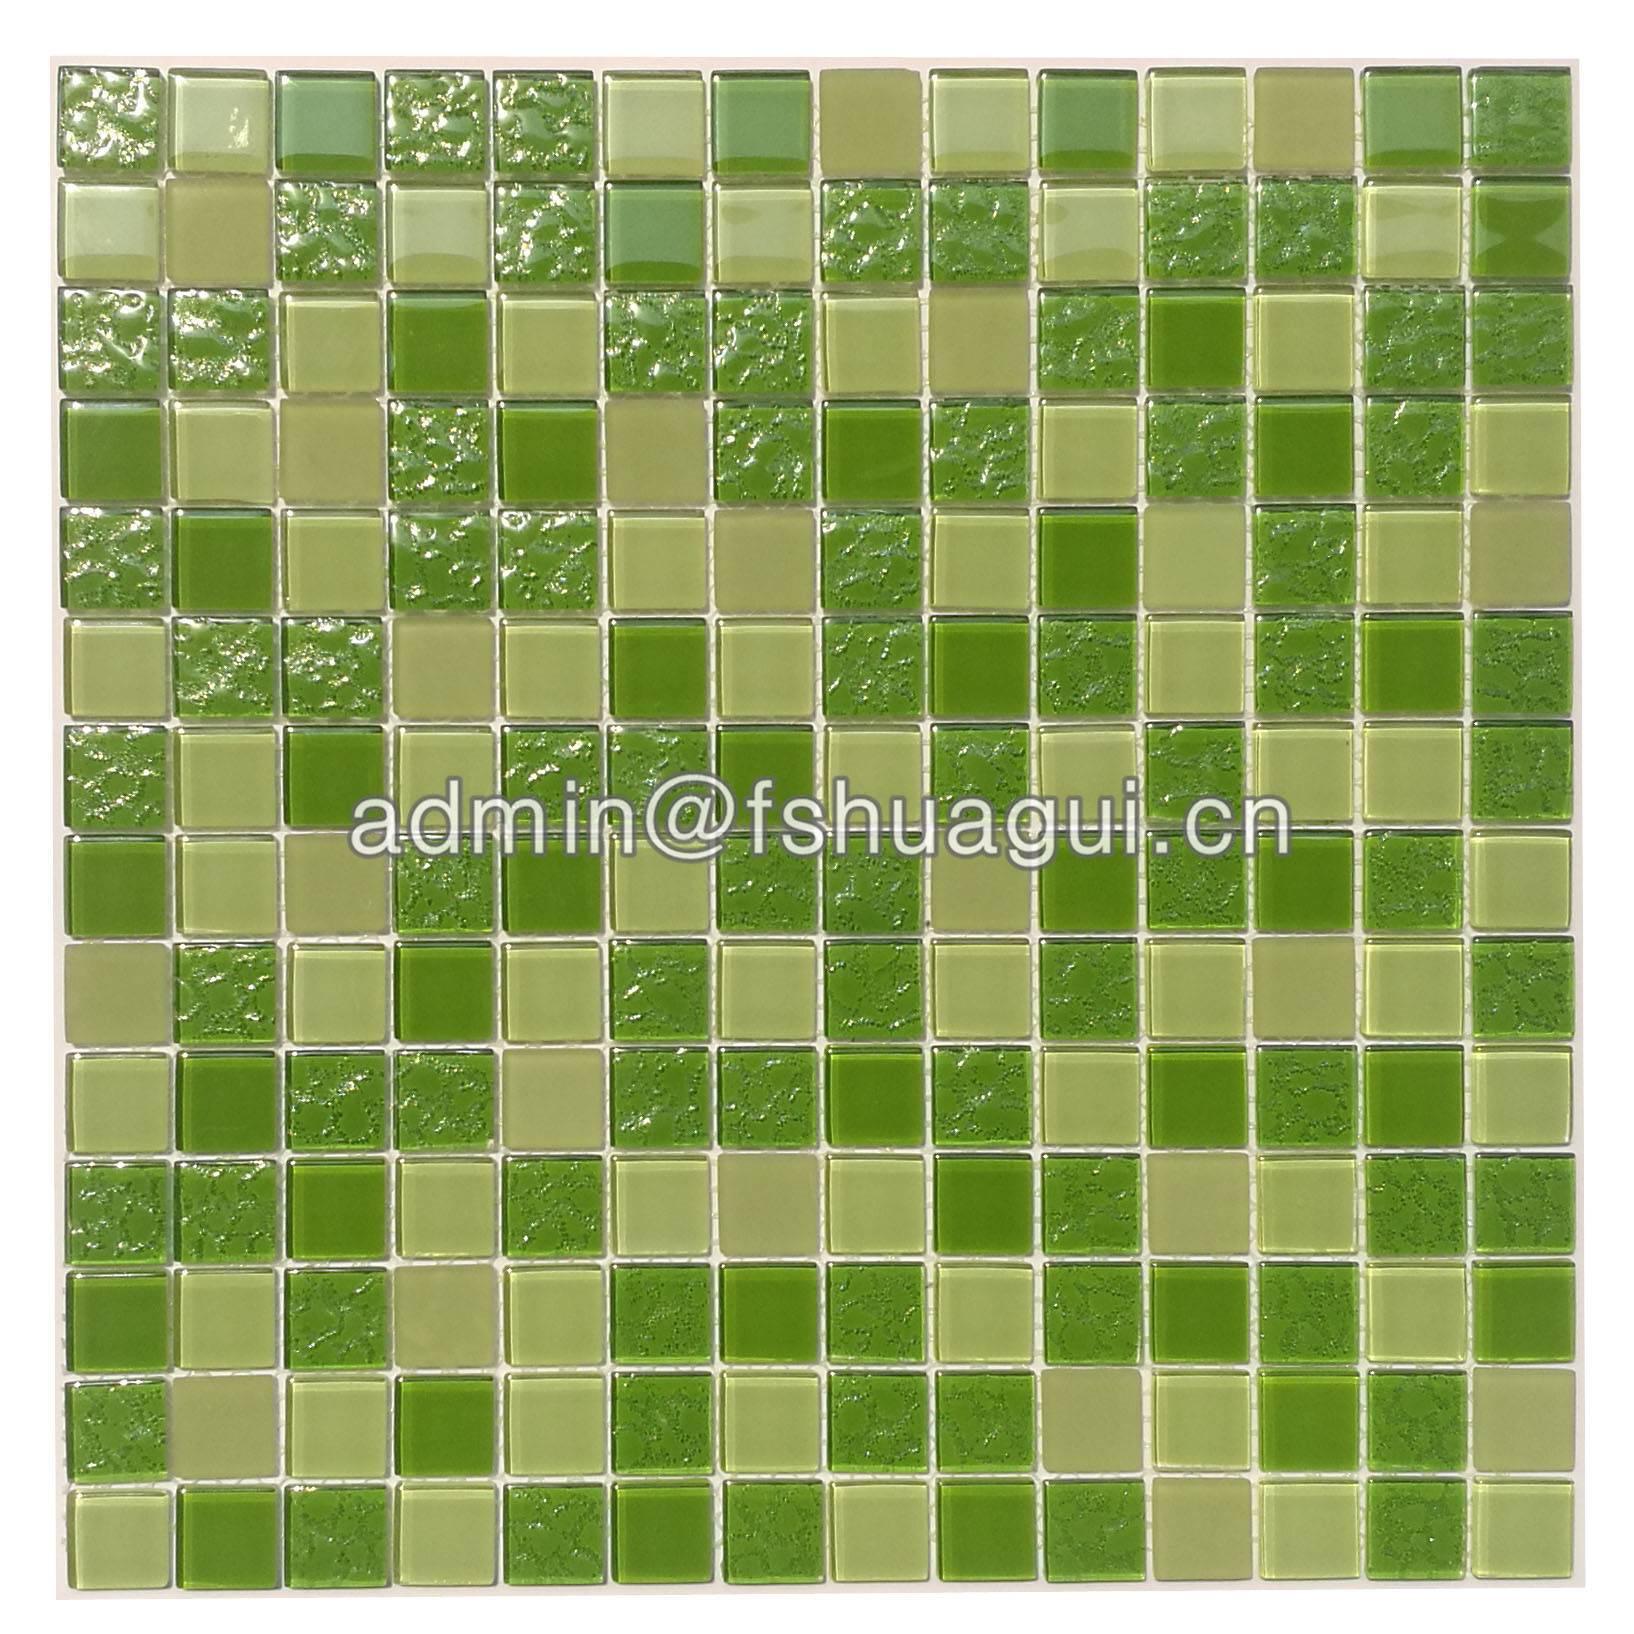 Huagui Fresh green anti slip glass mosaic bathroom tiles singapore HG-420011 GLASS MOSAIC TILE image4